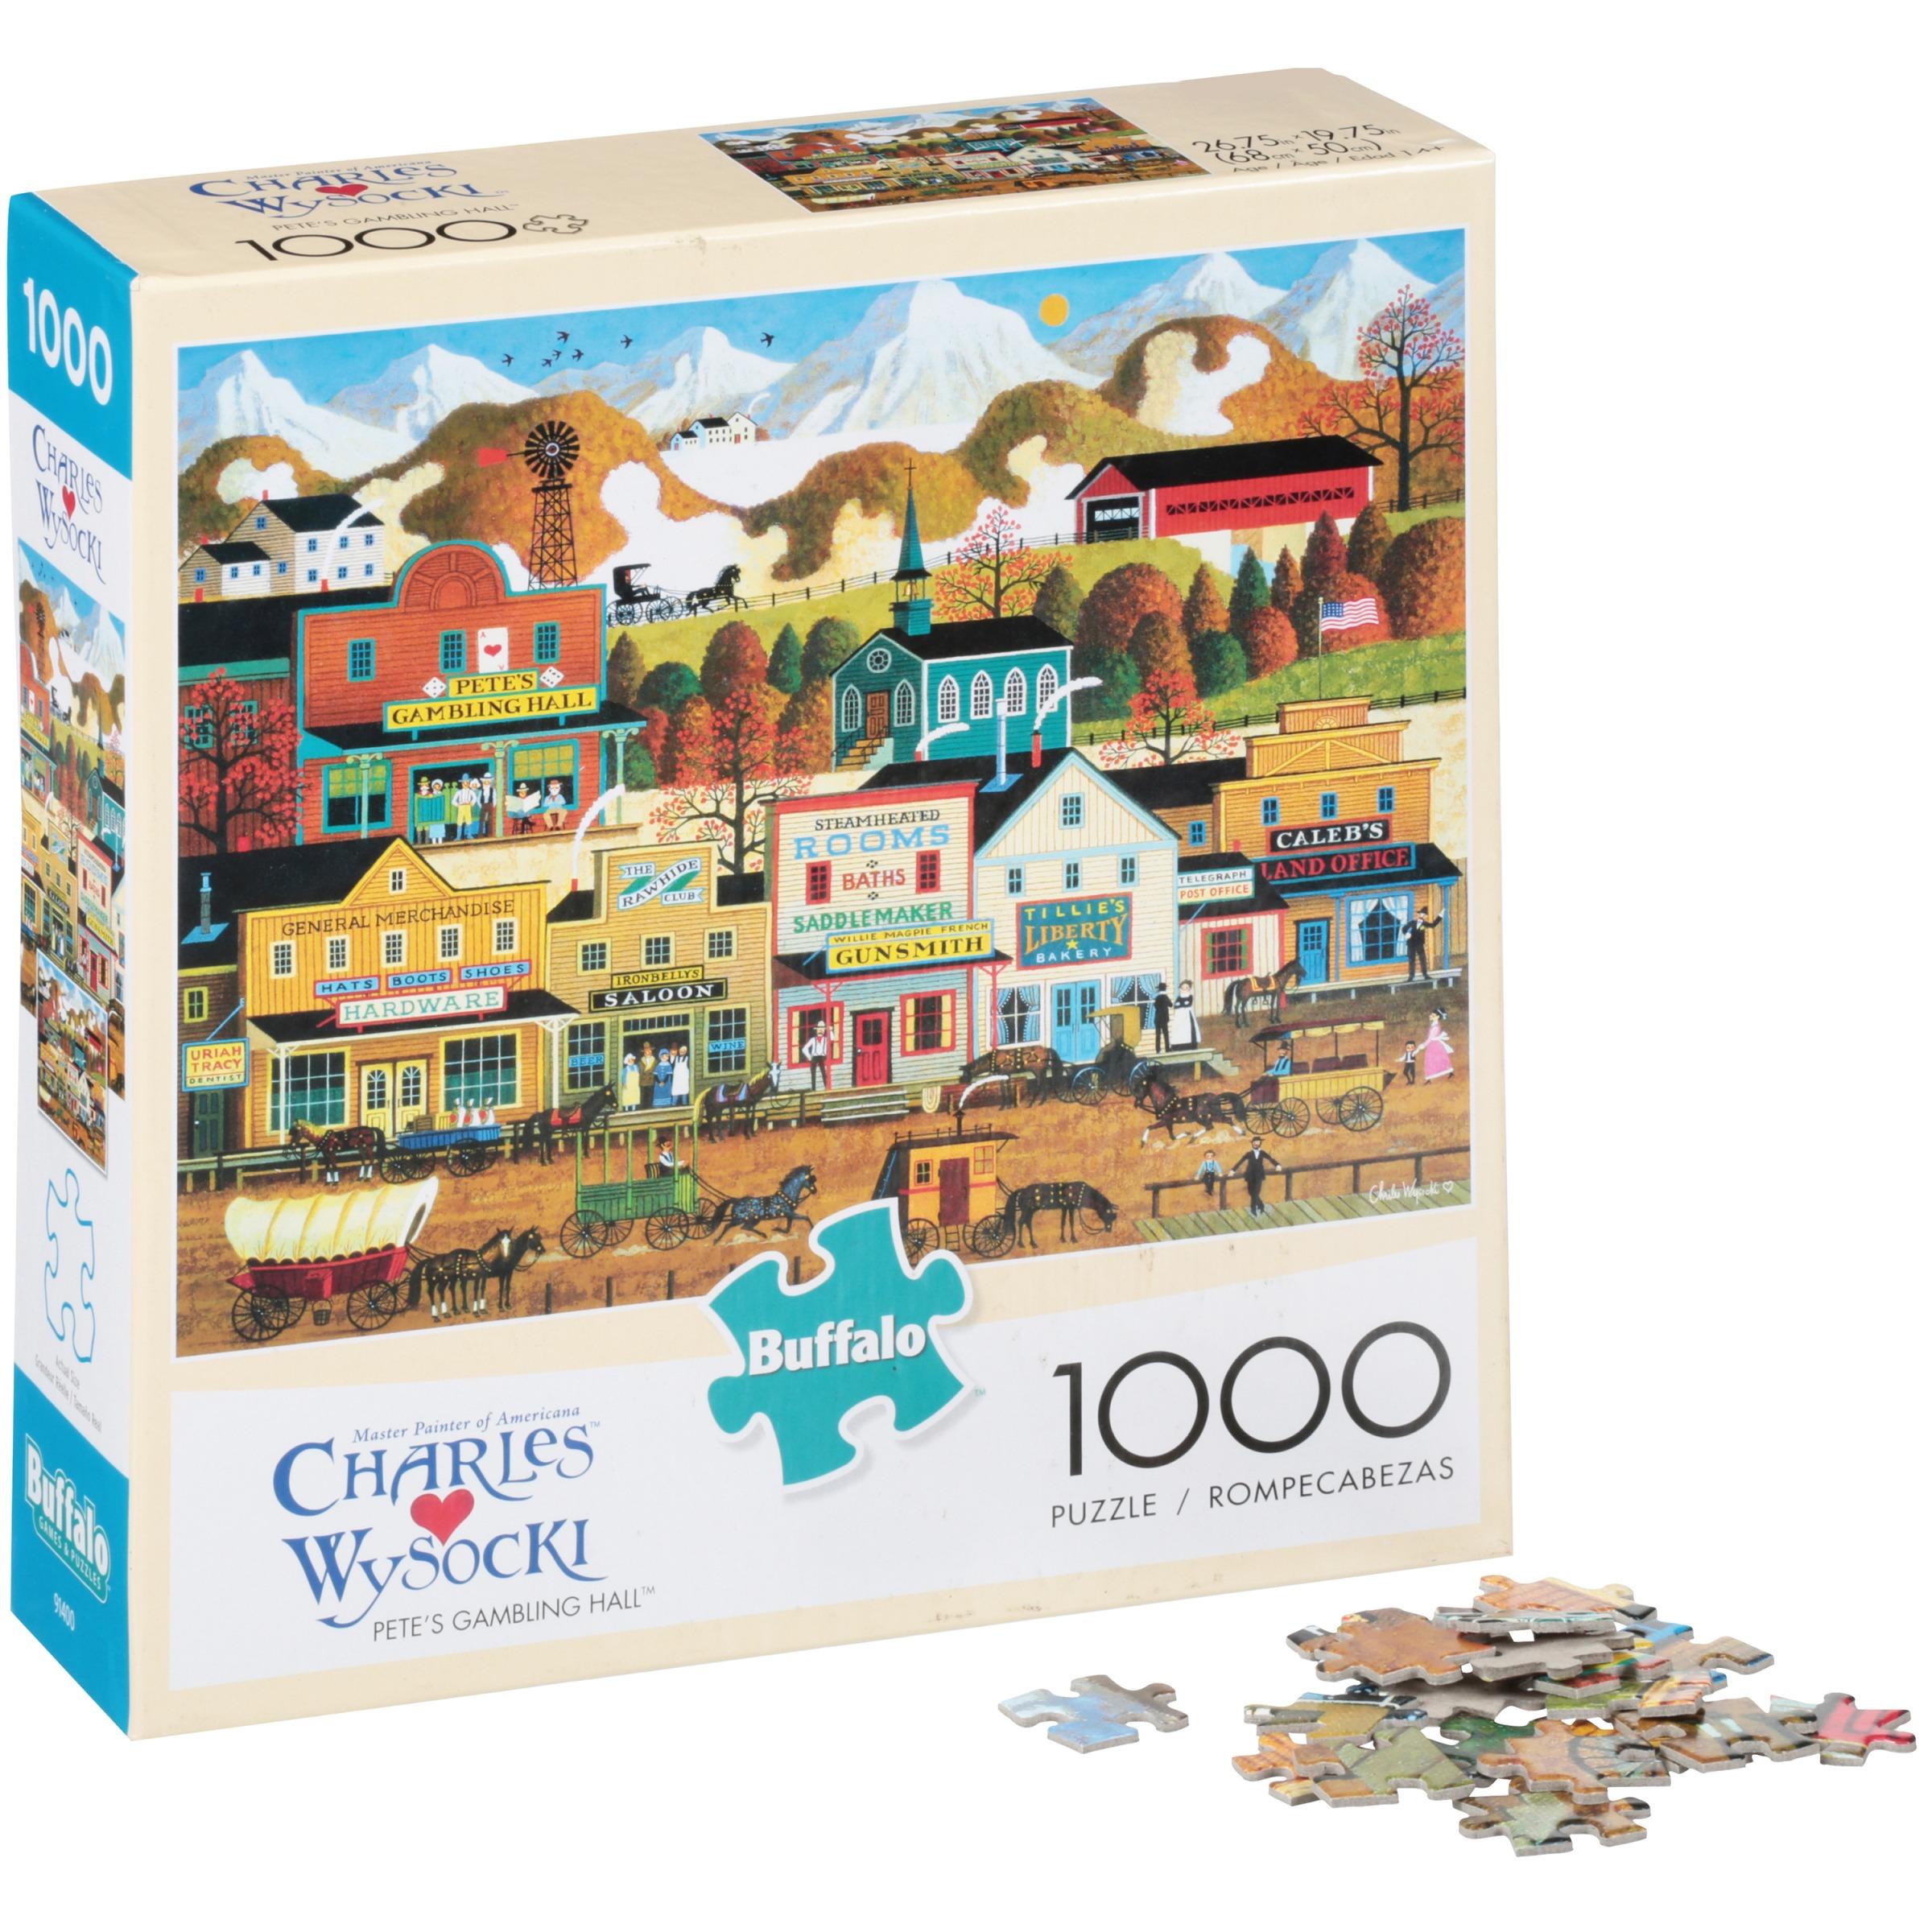 Buffalo™ Charles Wysocki Pete's Gambling Hall™ 1000 pc Puzzle